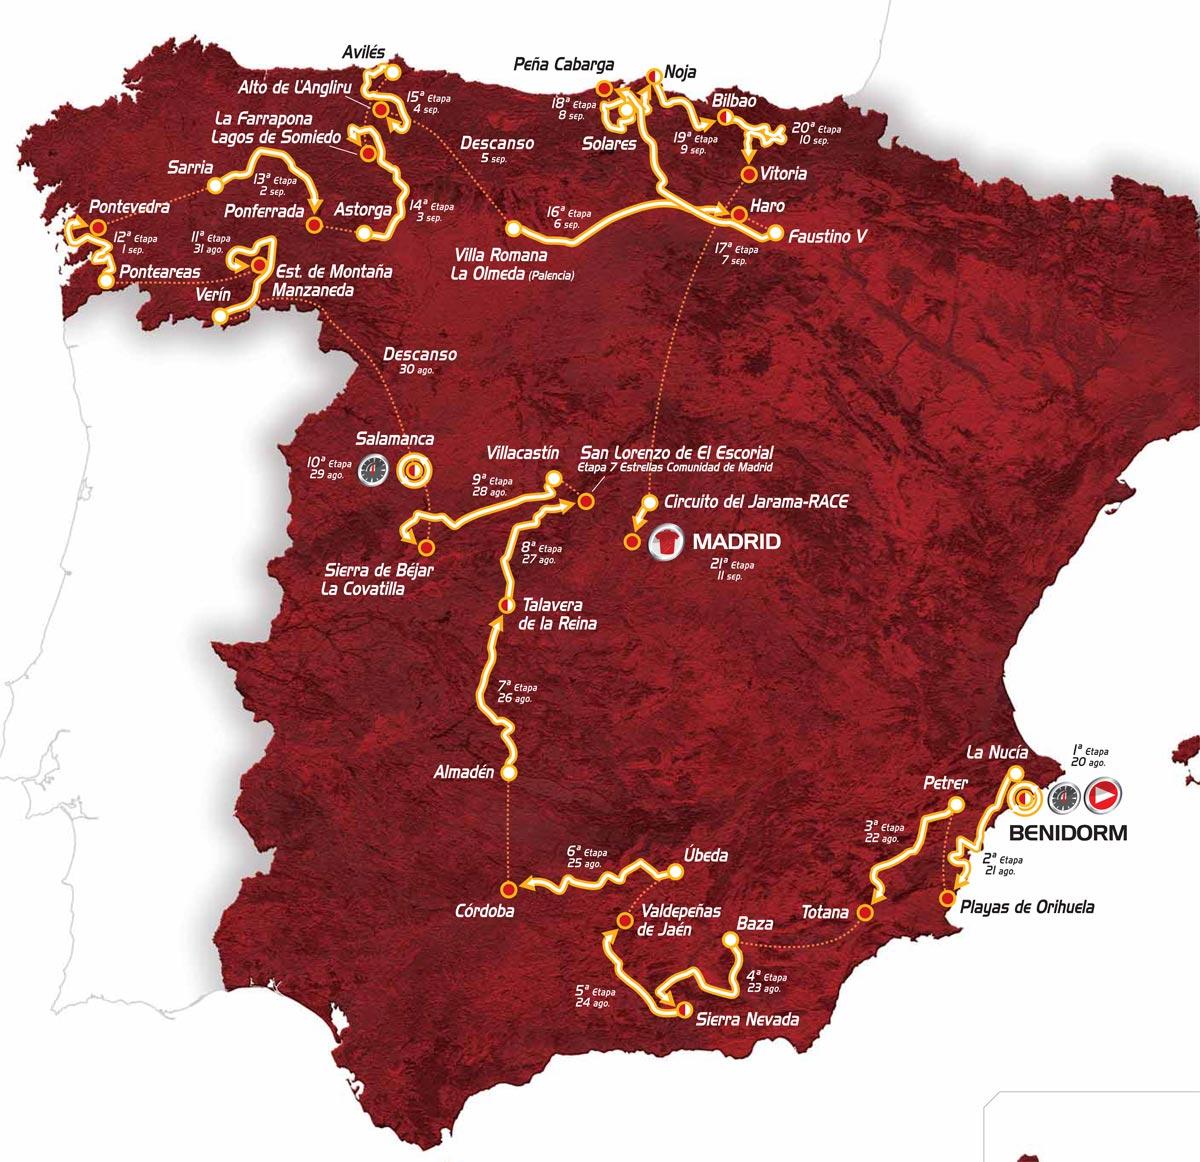 Vuelta a Espana 2011 map